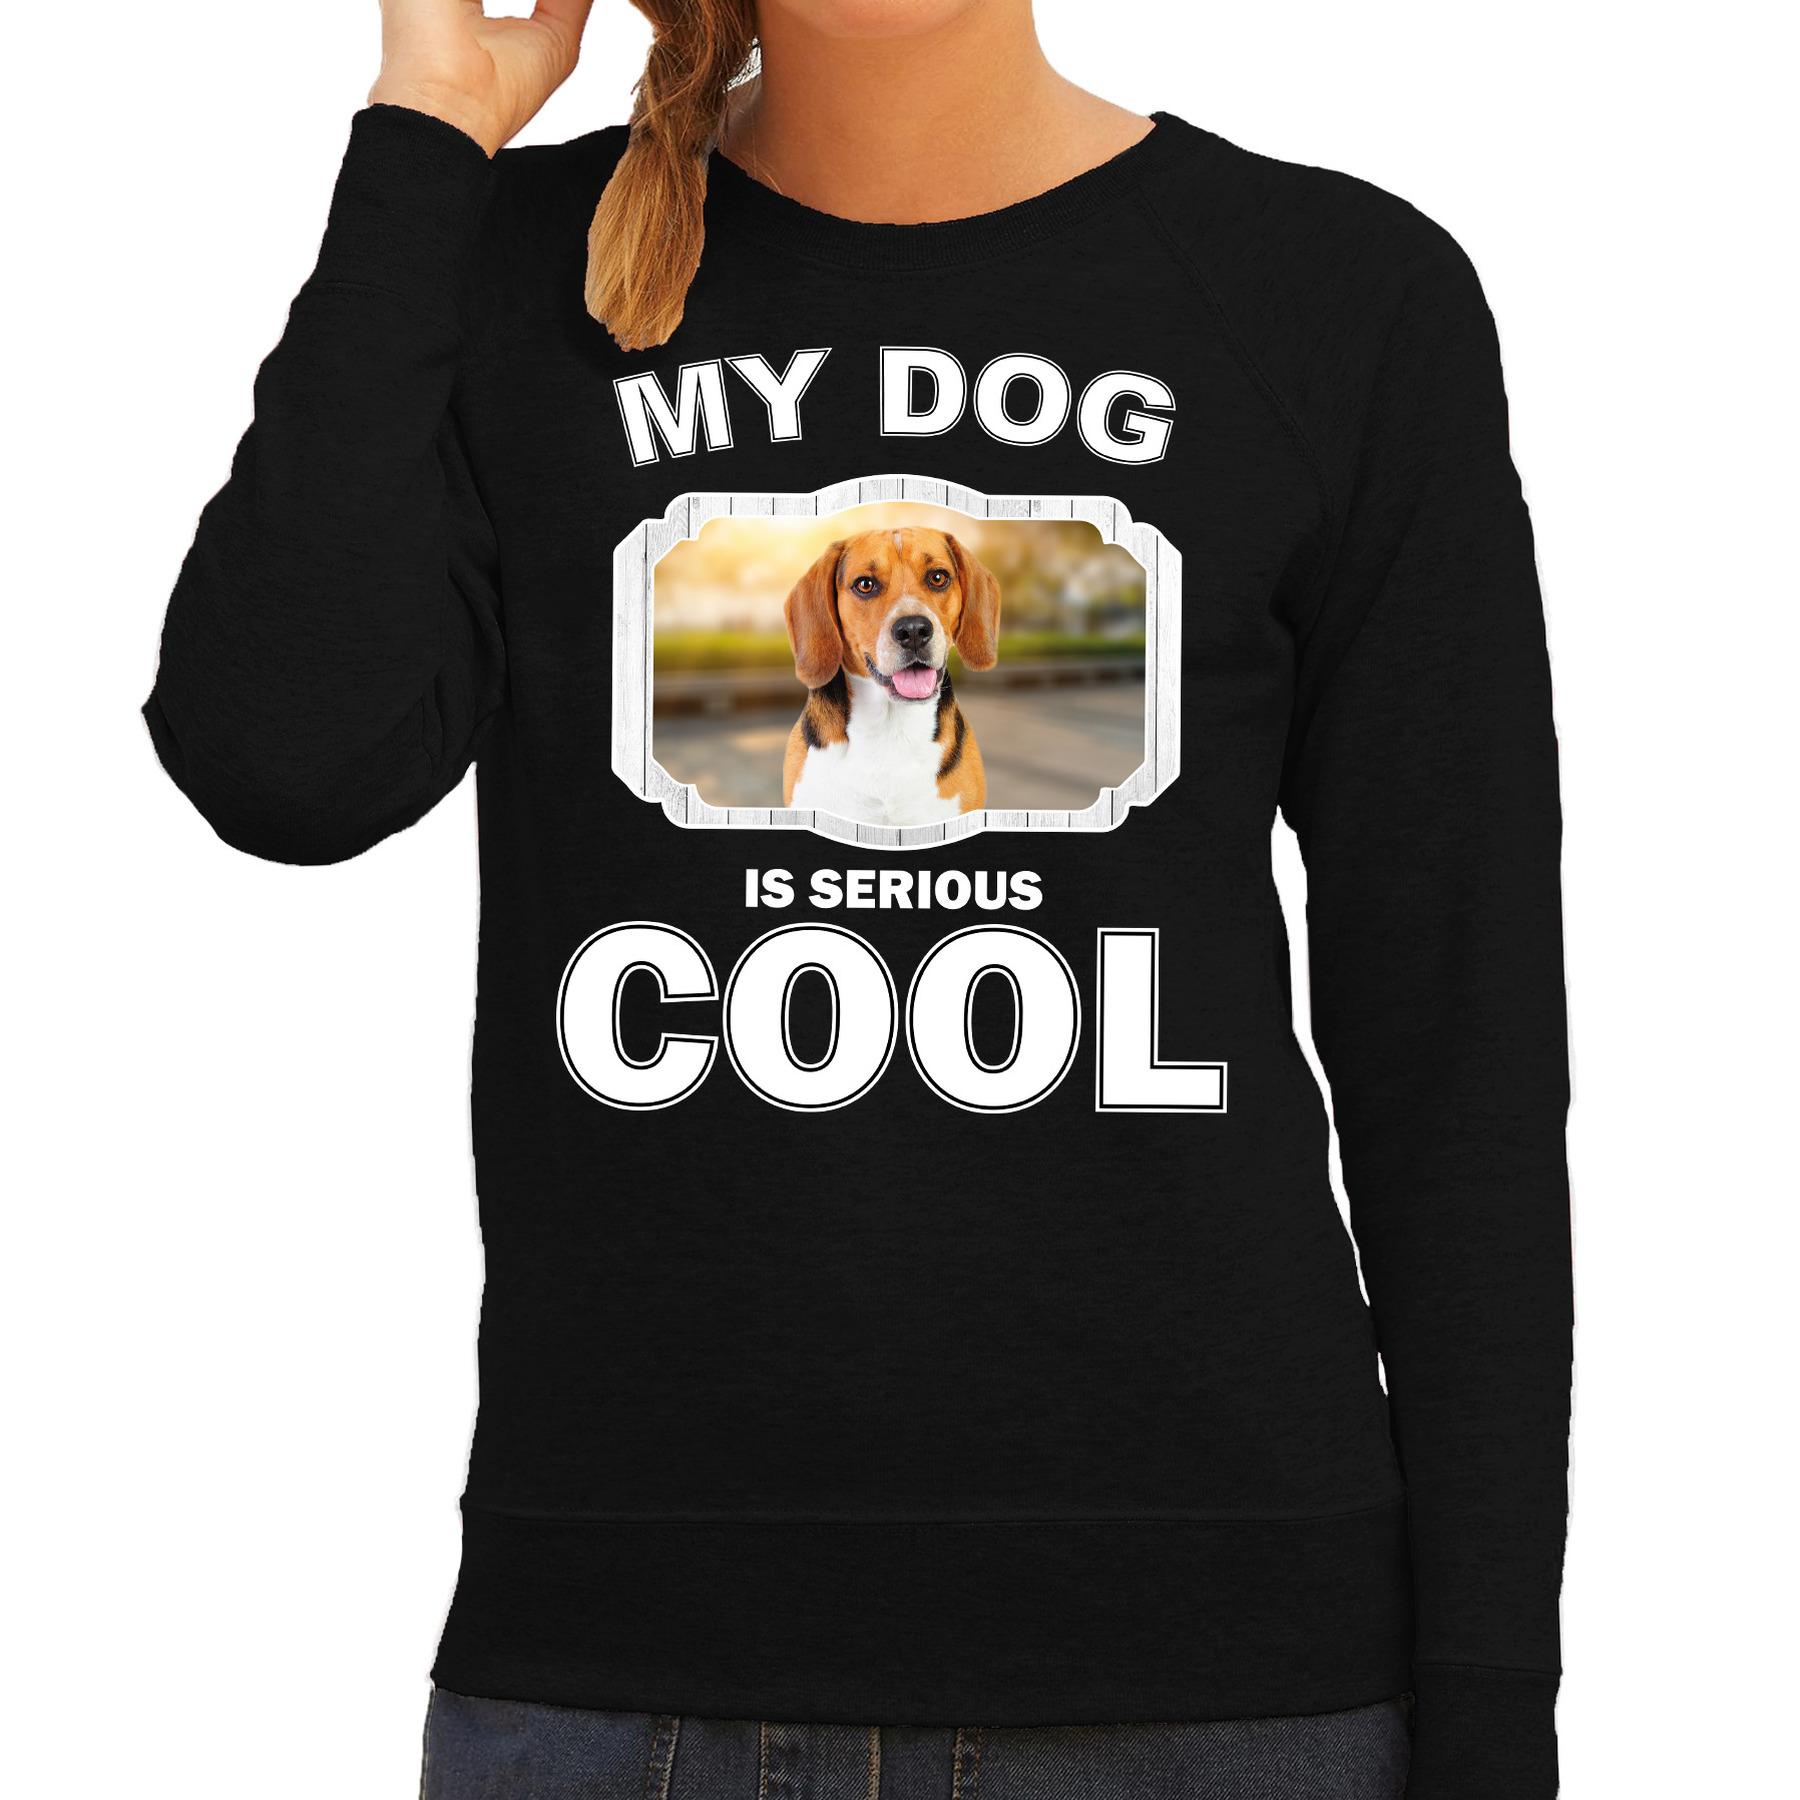 Honden liefhebber trui / sweater Beagle my dog is serious cool zwart voor dames